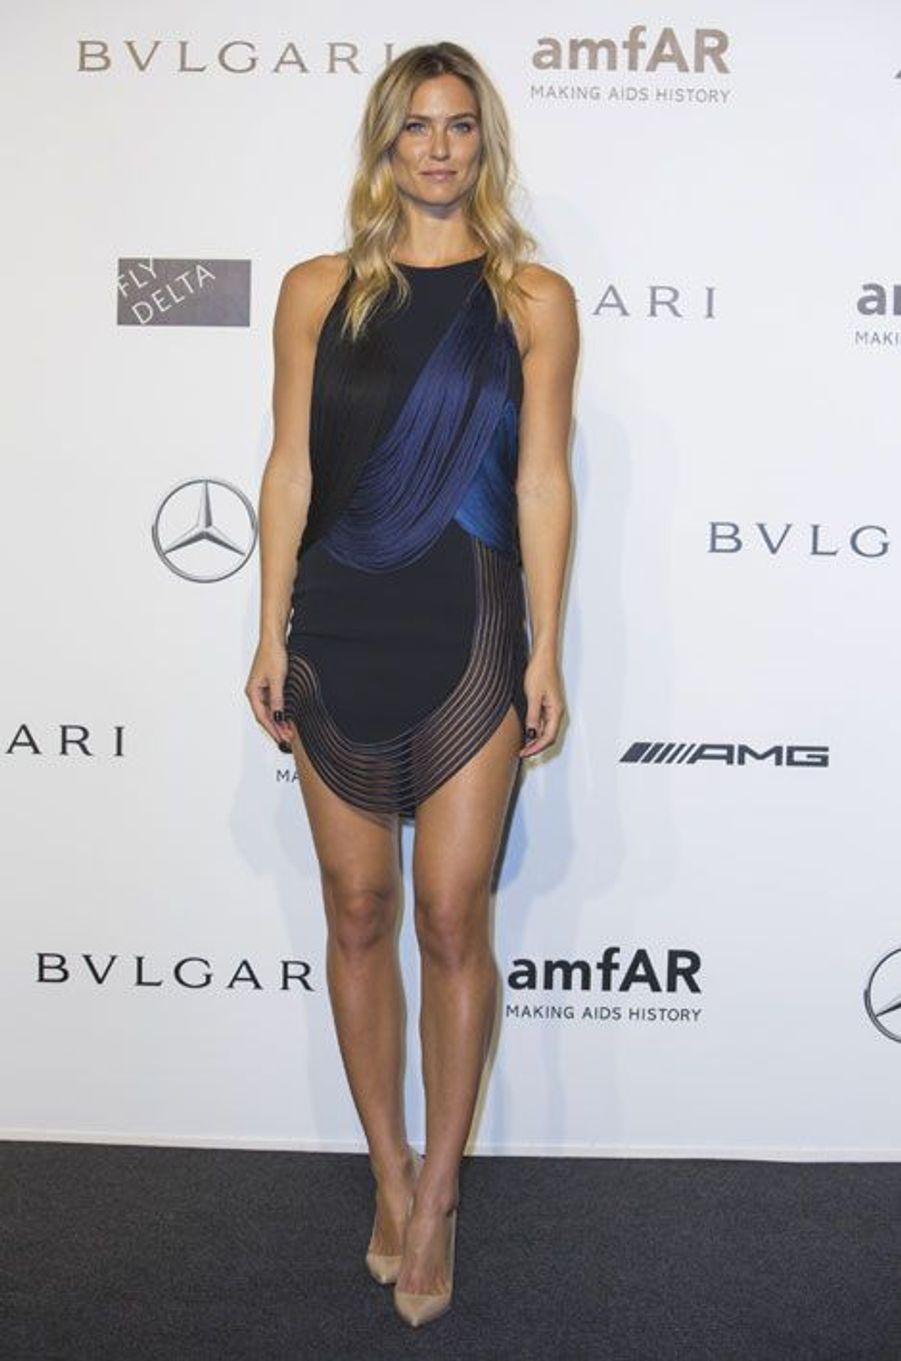 Le top israelien Bar Rafaeli en Stella McCartney, au gala de l'amfAR à Milan, le 20 septembre 2014